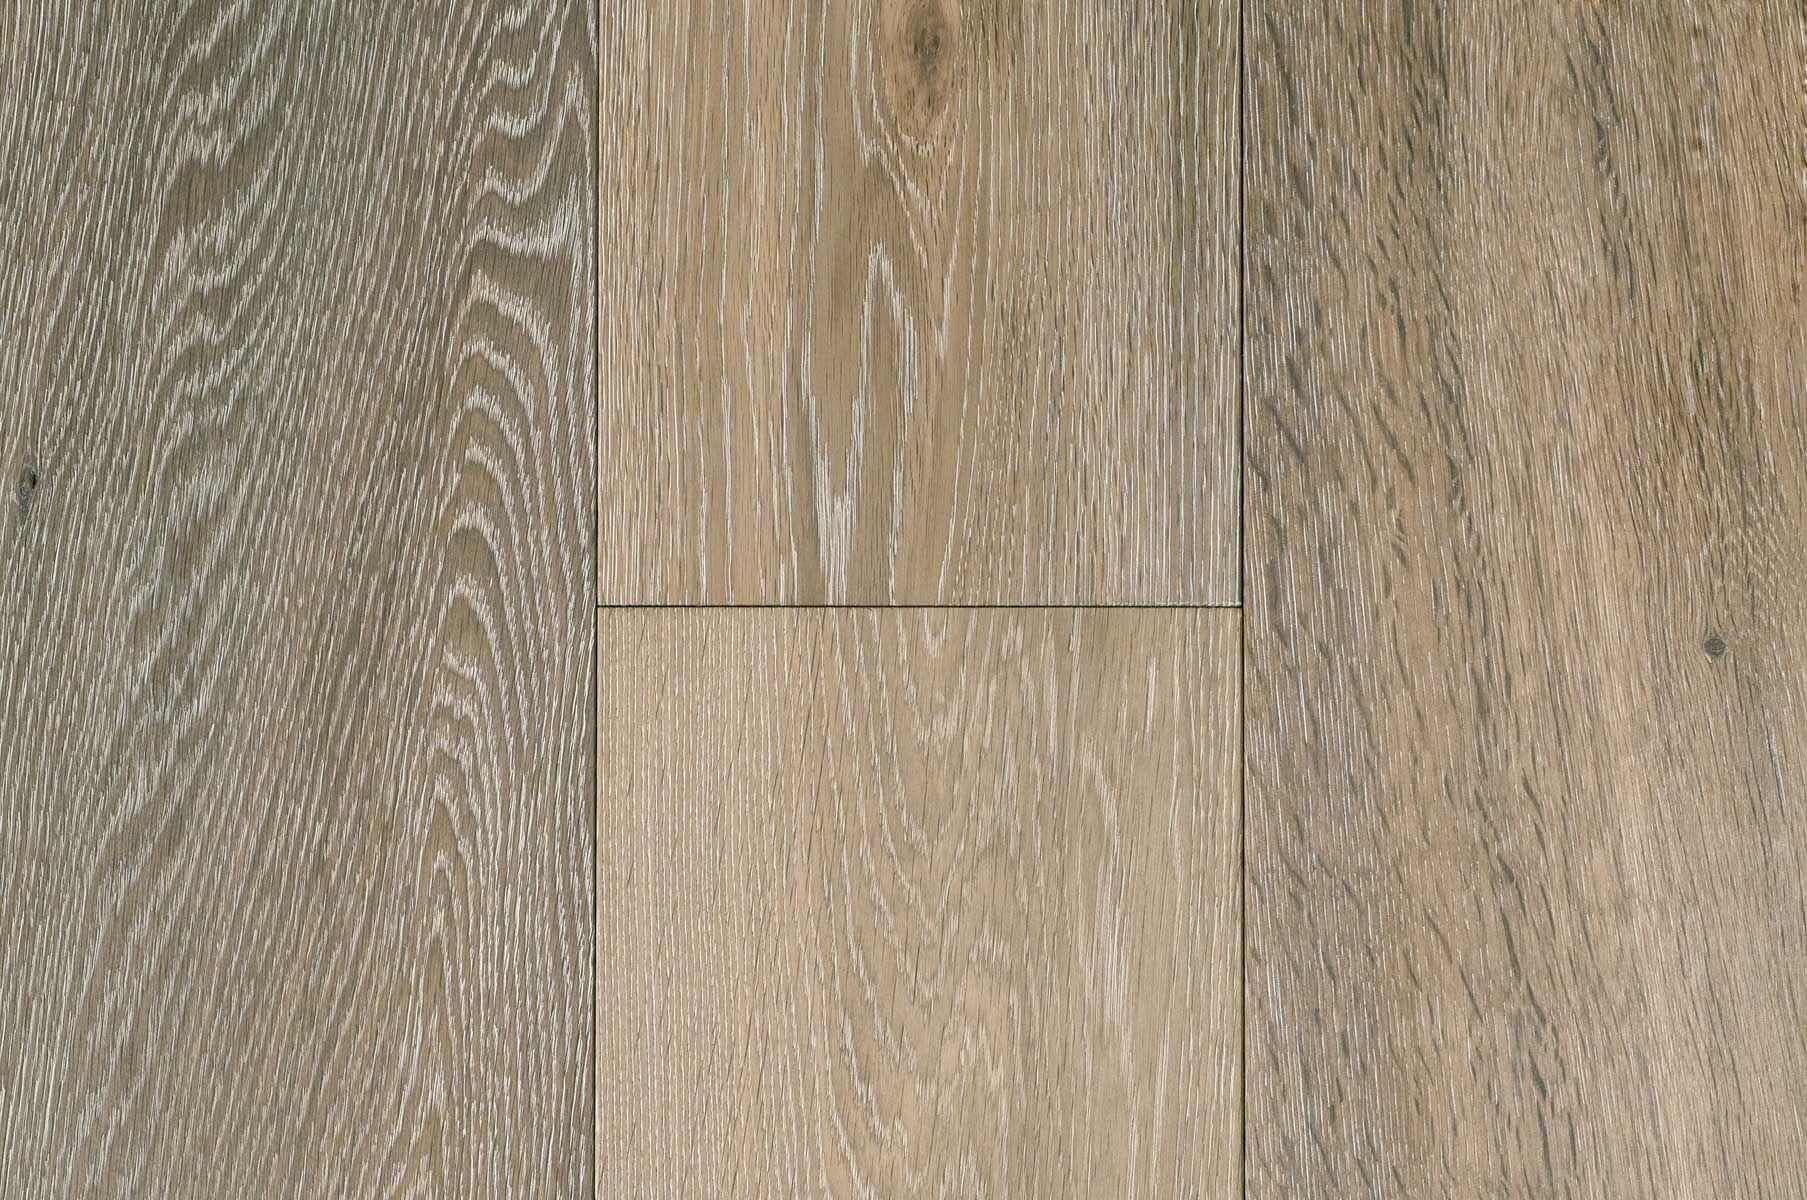 Lugano Oak Hardwood Flooring Contemporary Floor Select Floor Oak Hardwood Flooring Duchateau Flooring